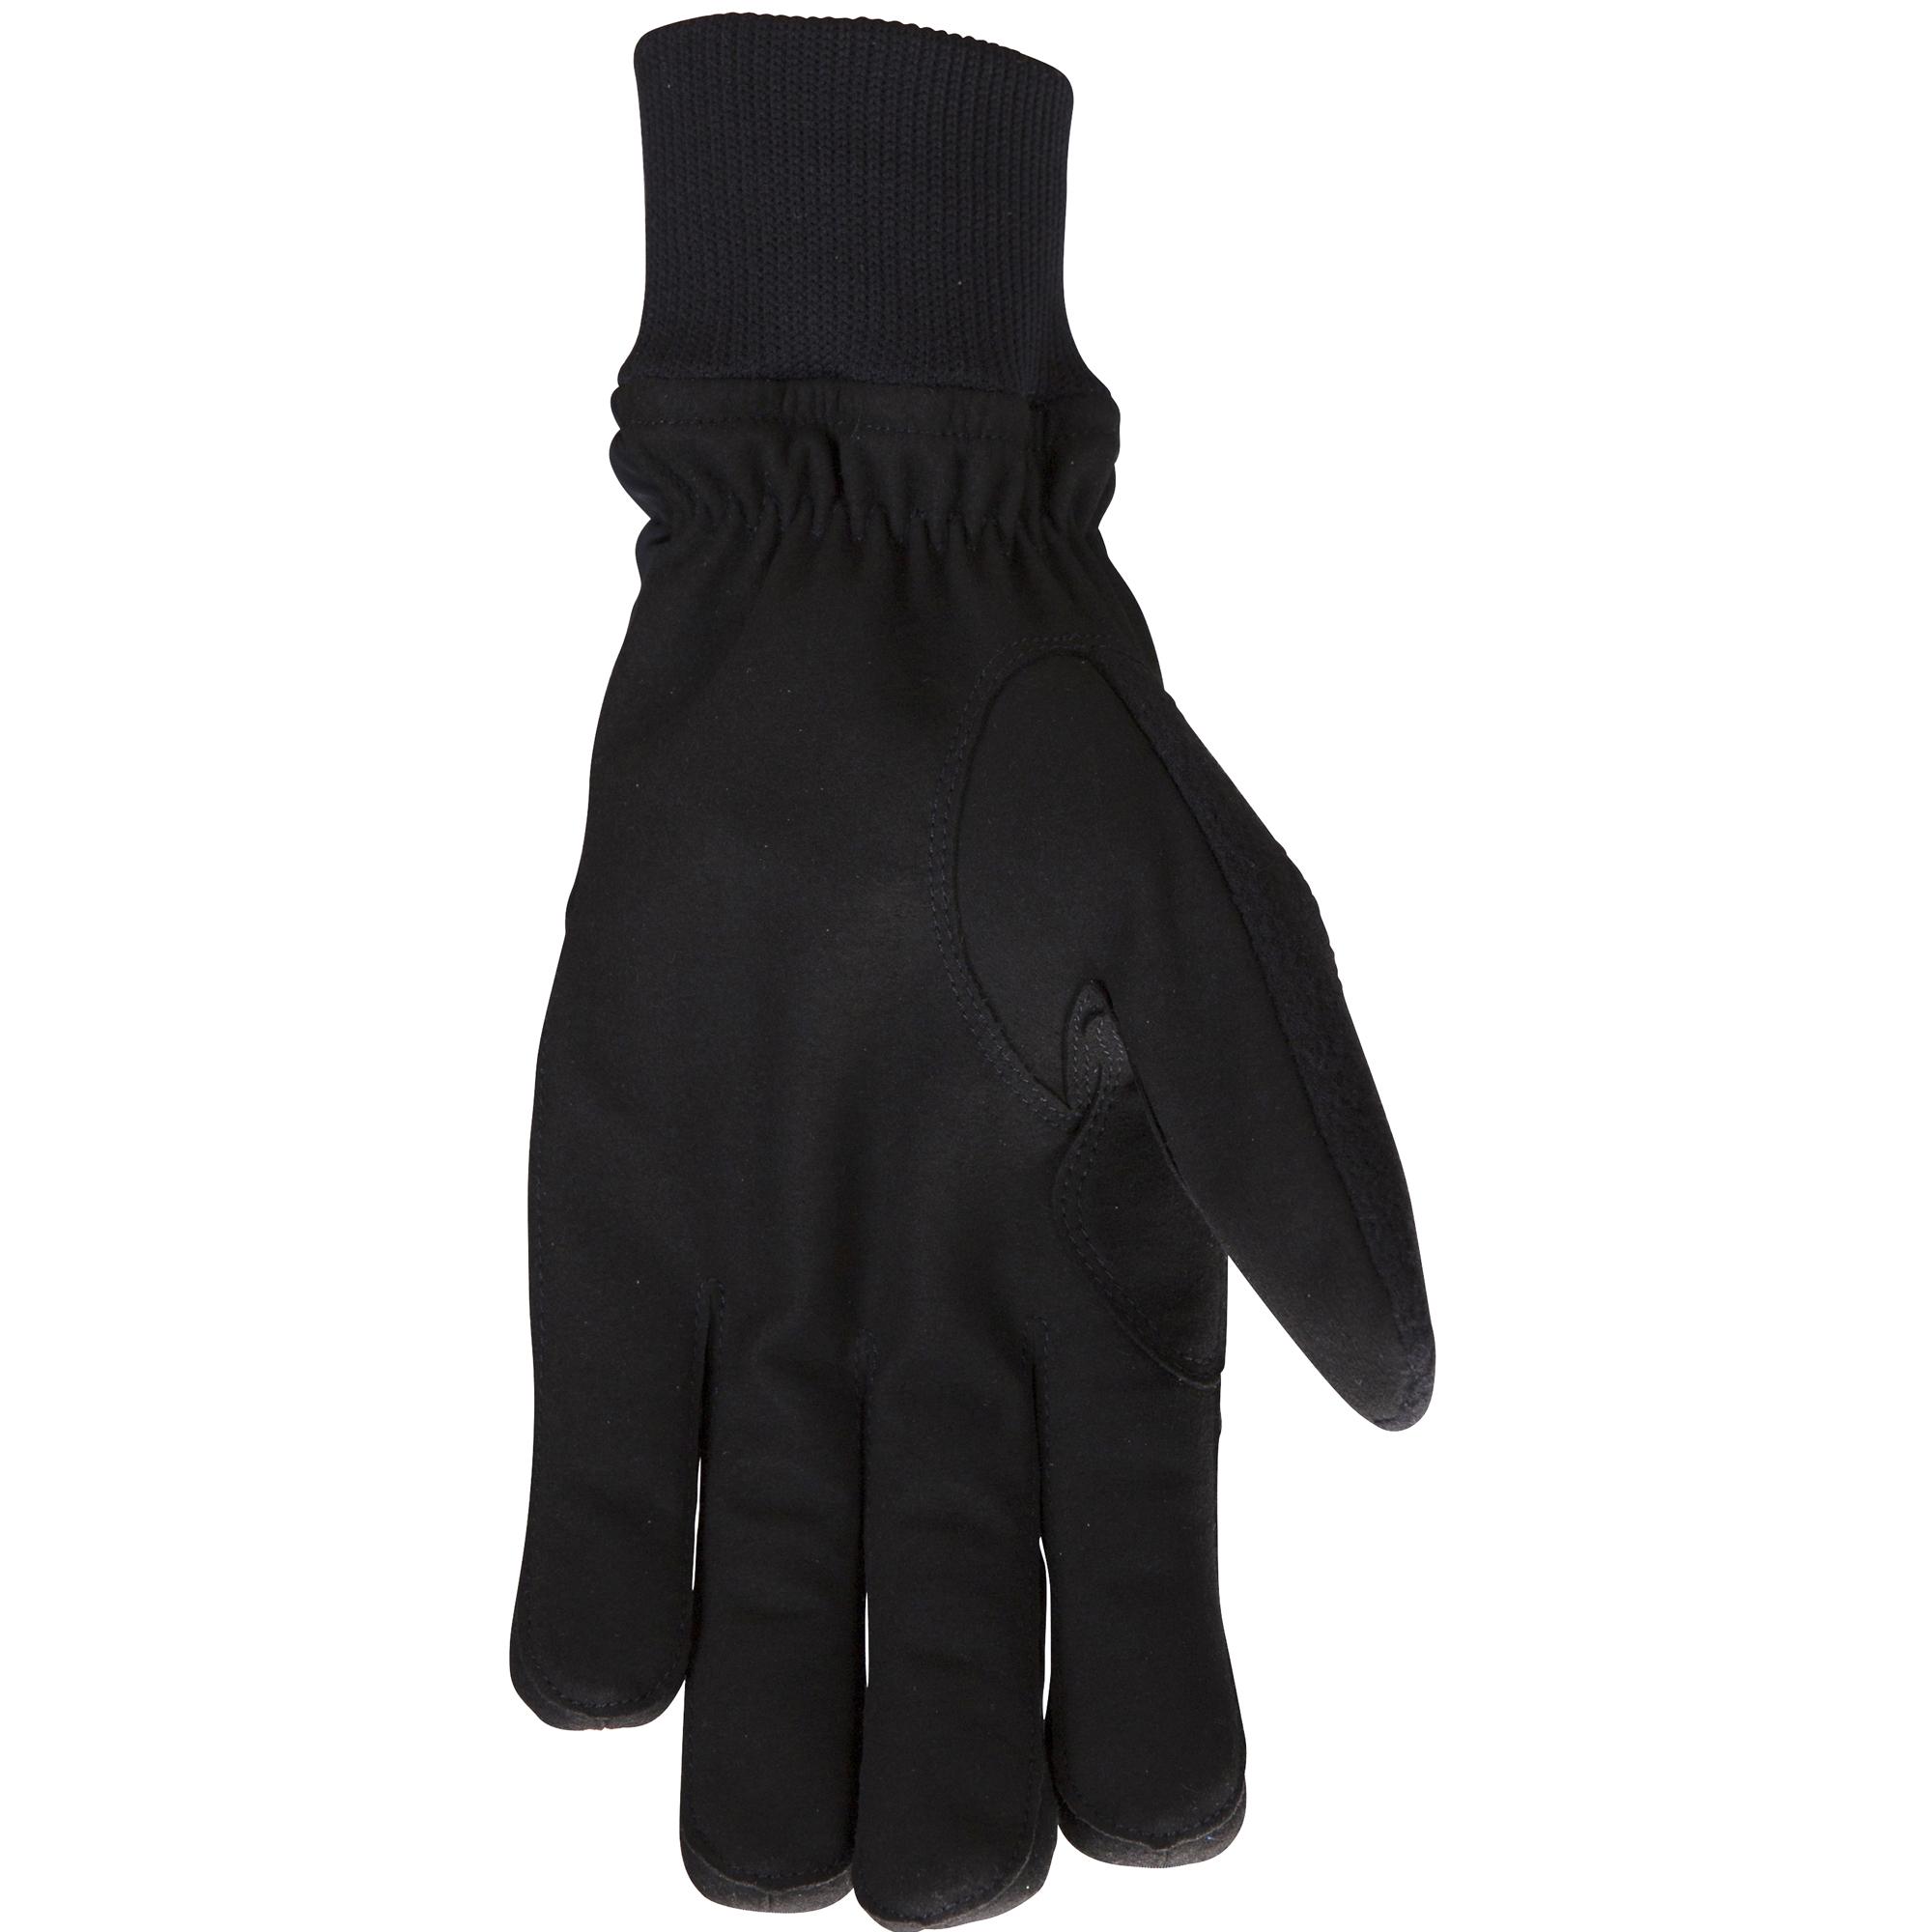 SWIX rukavice pánské Pollux H0871.10000  a0b08a5750